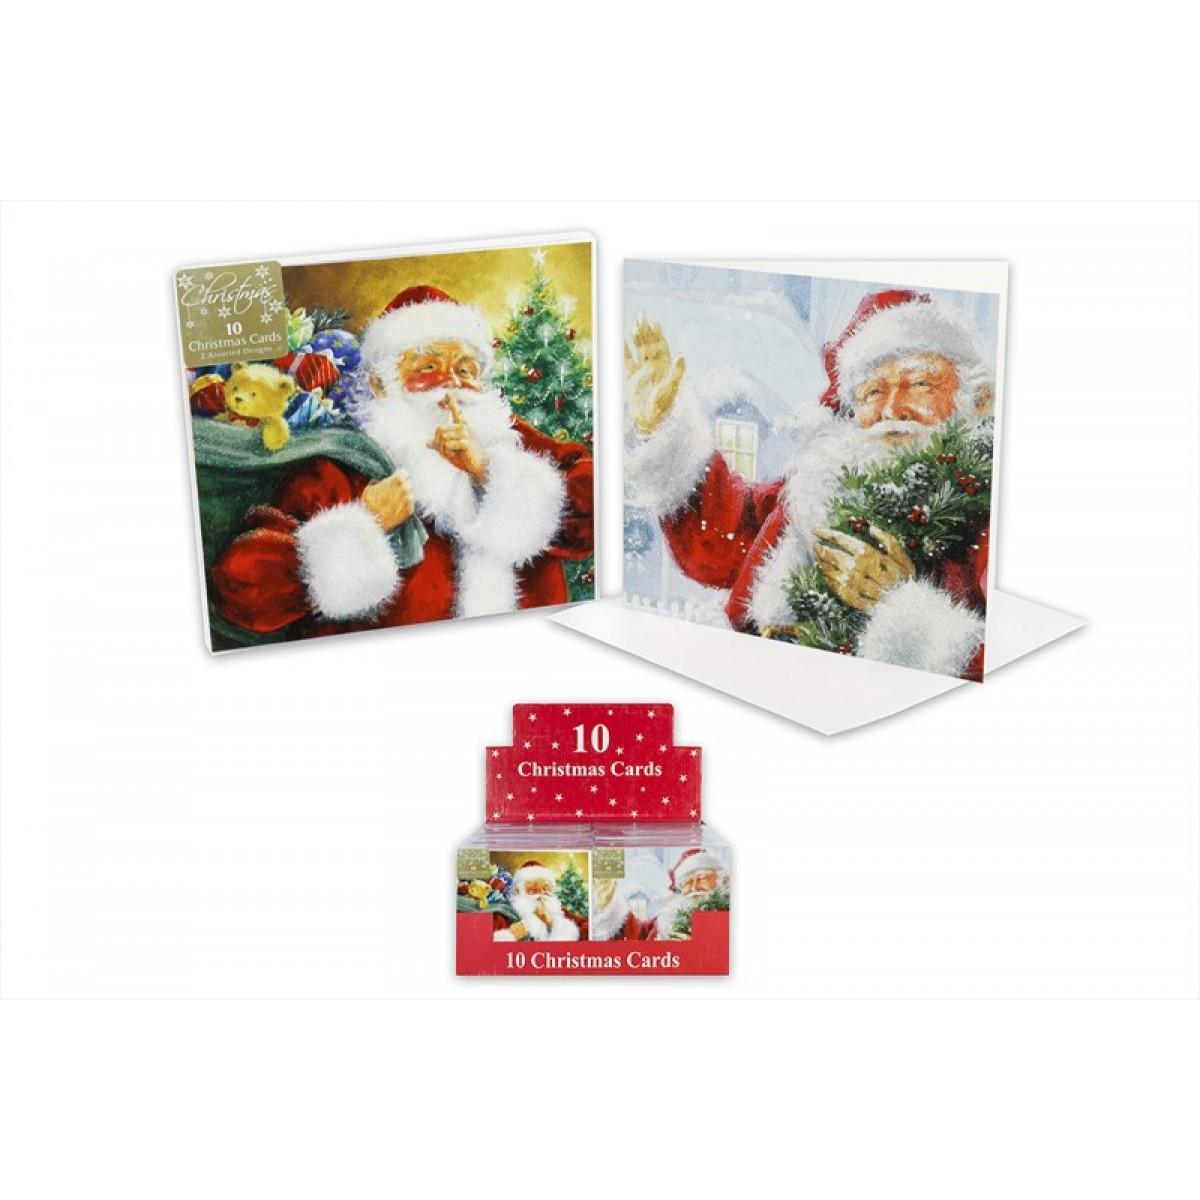 Glitter Christmas Cards.10 Traditional Santa Glitter Christmas Cards